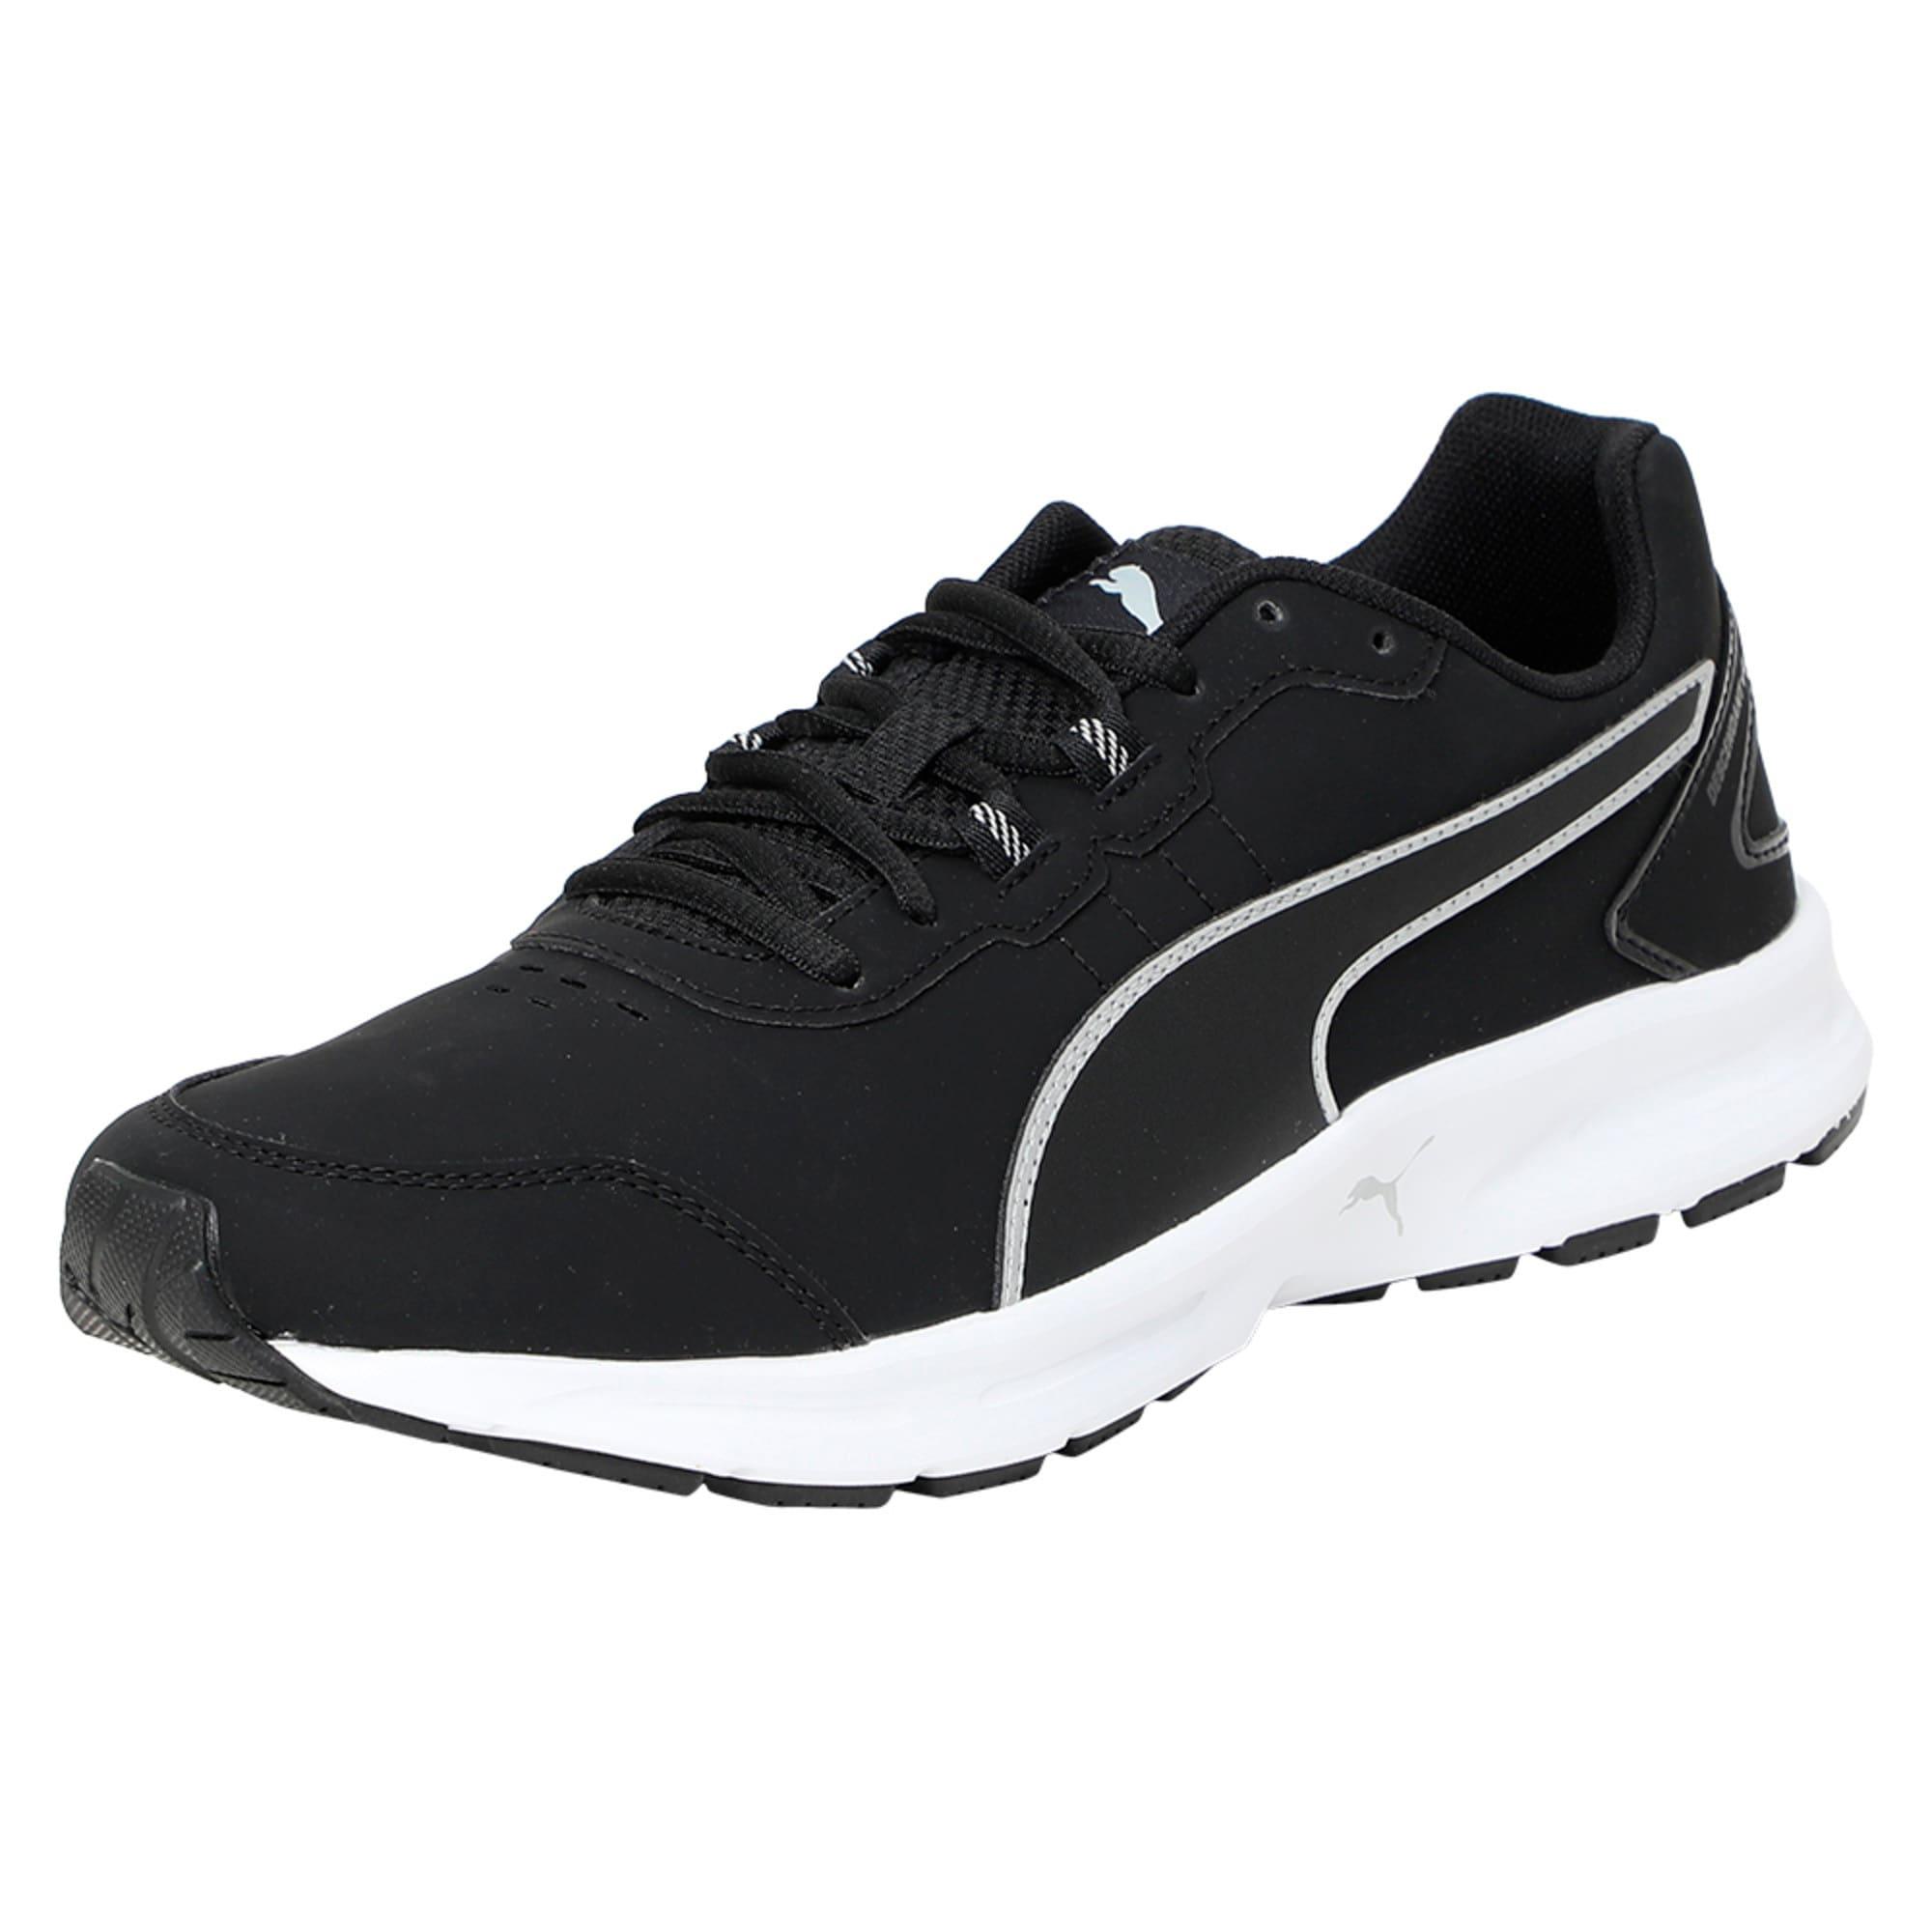 Thumbnail 1 of Descendant v4 SL Running Shoes, Puma Black-Puma Silver, medium-IND